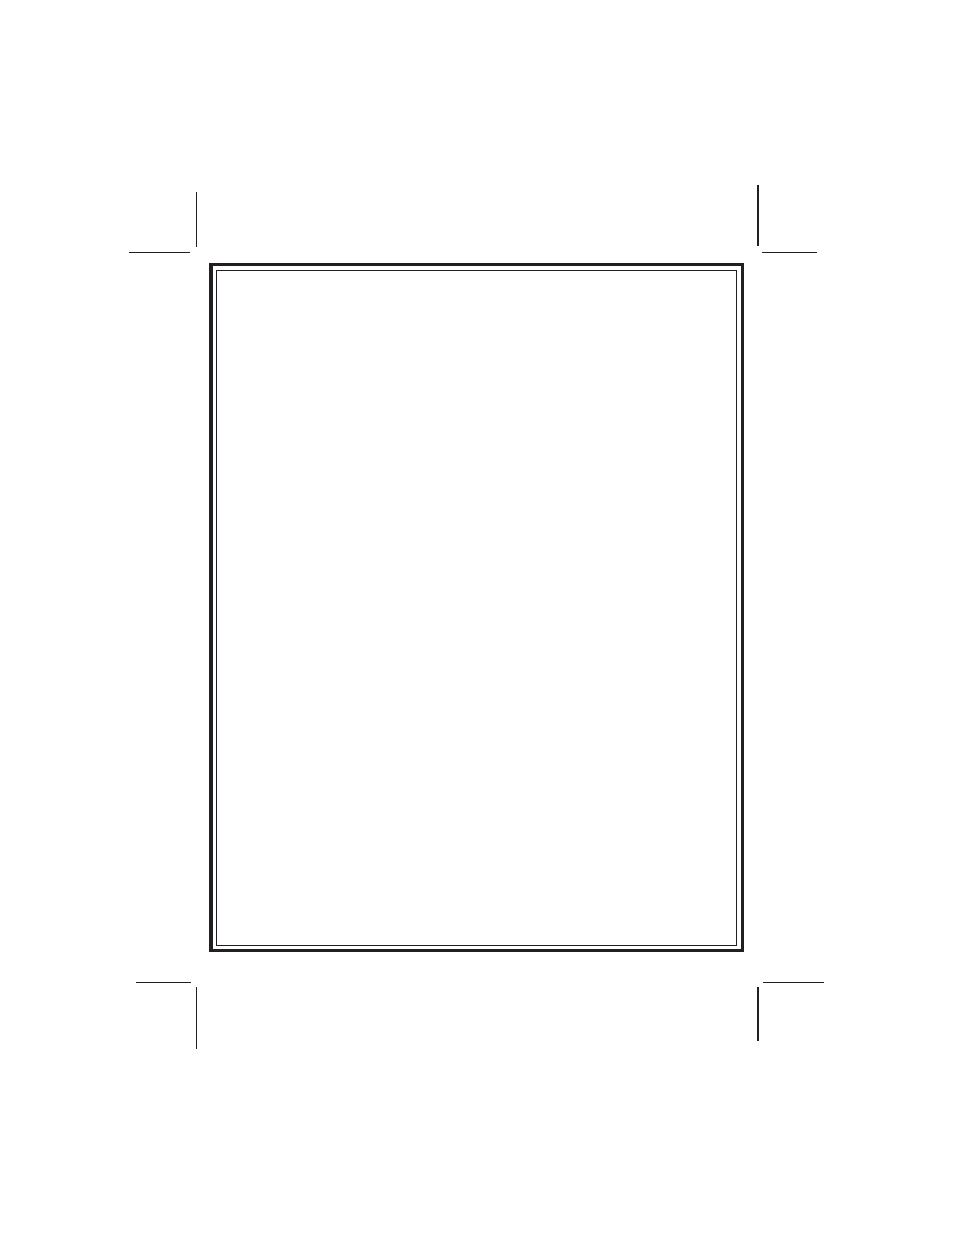 code alarm ca611 user manual page 10 13 rh manualsdir com